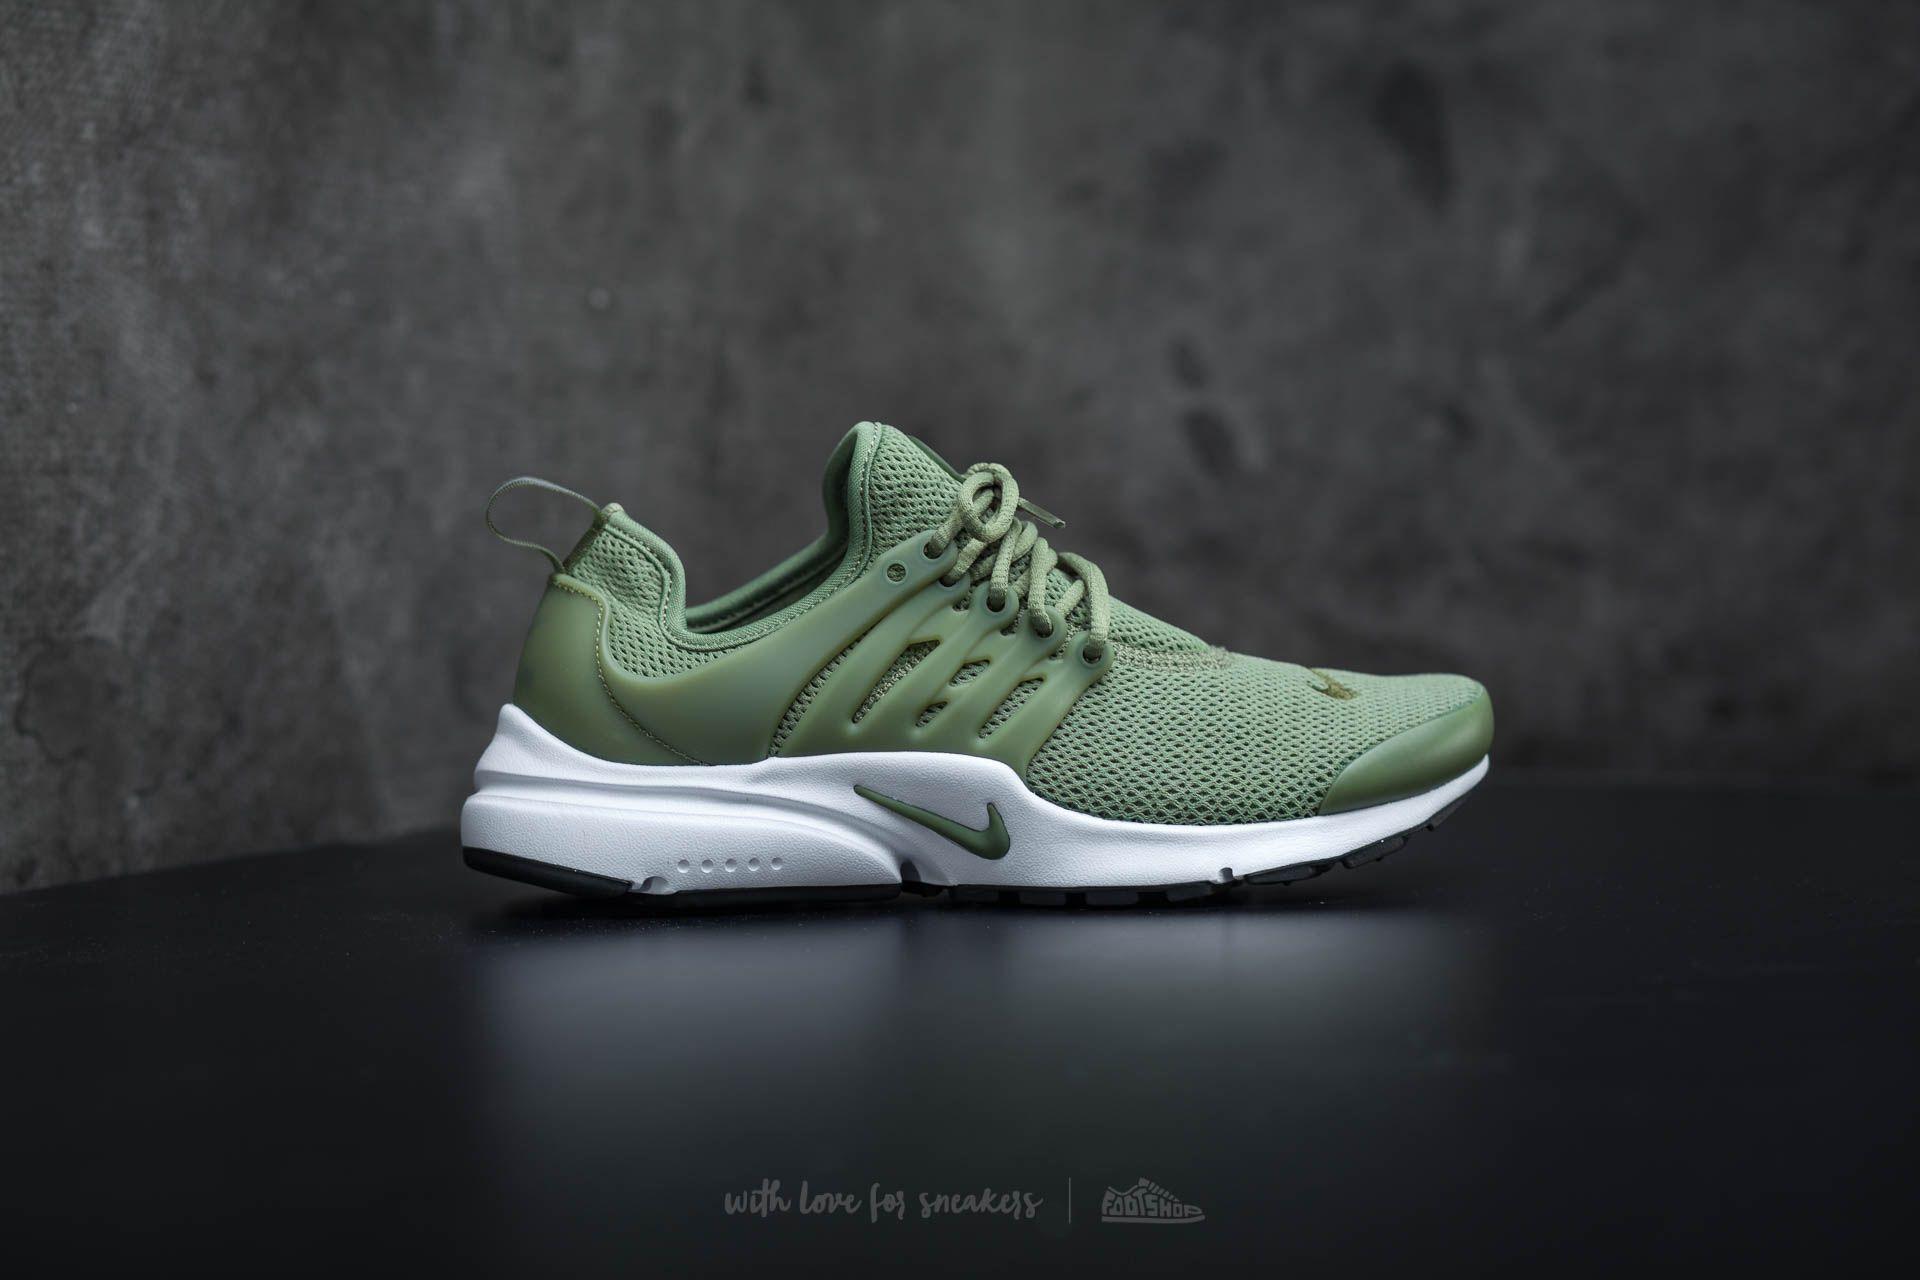 b71058b955f Lyst - Nike W Air Presto Palm Green  Palm Green in Green for Men